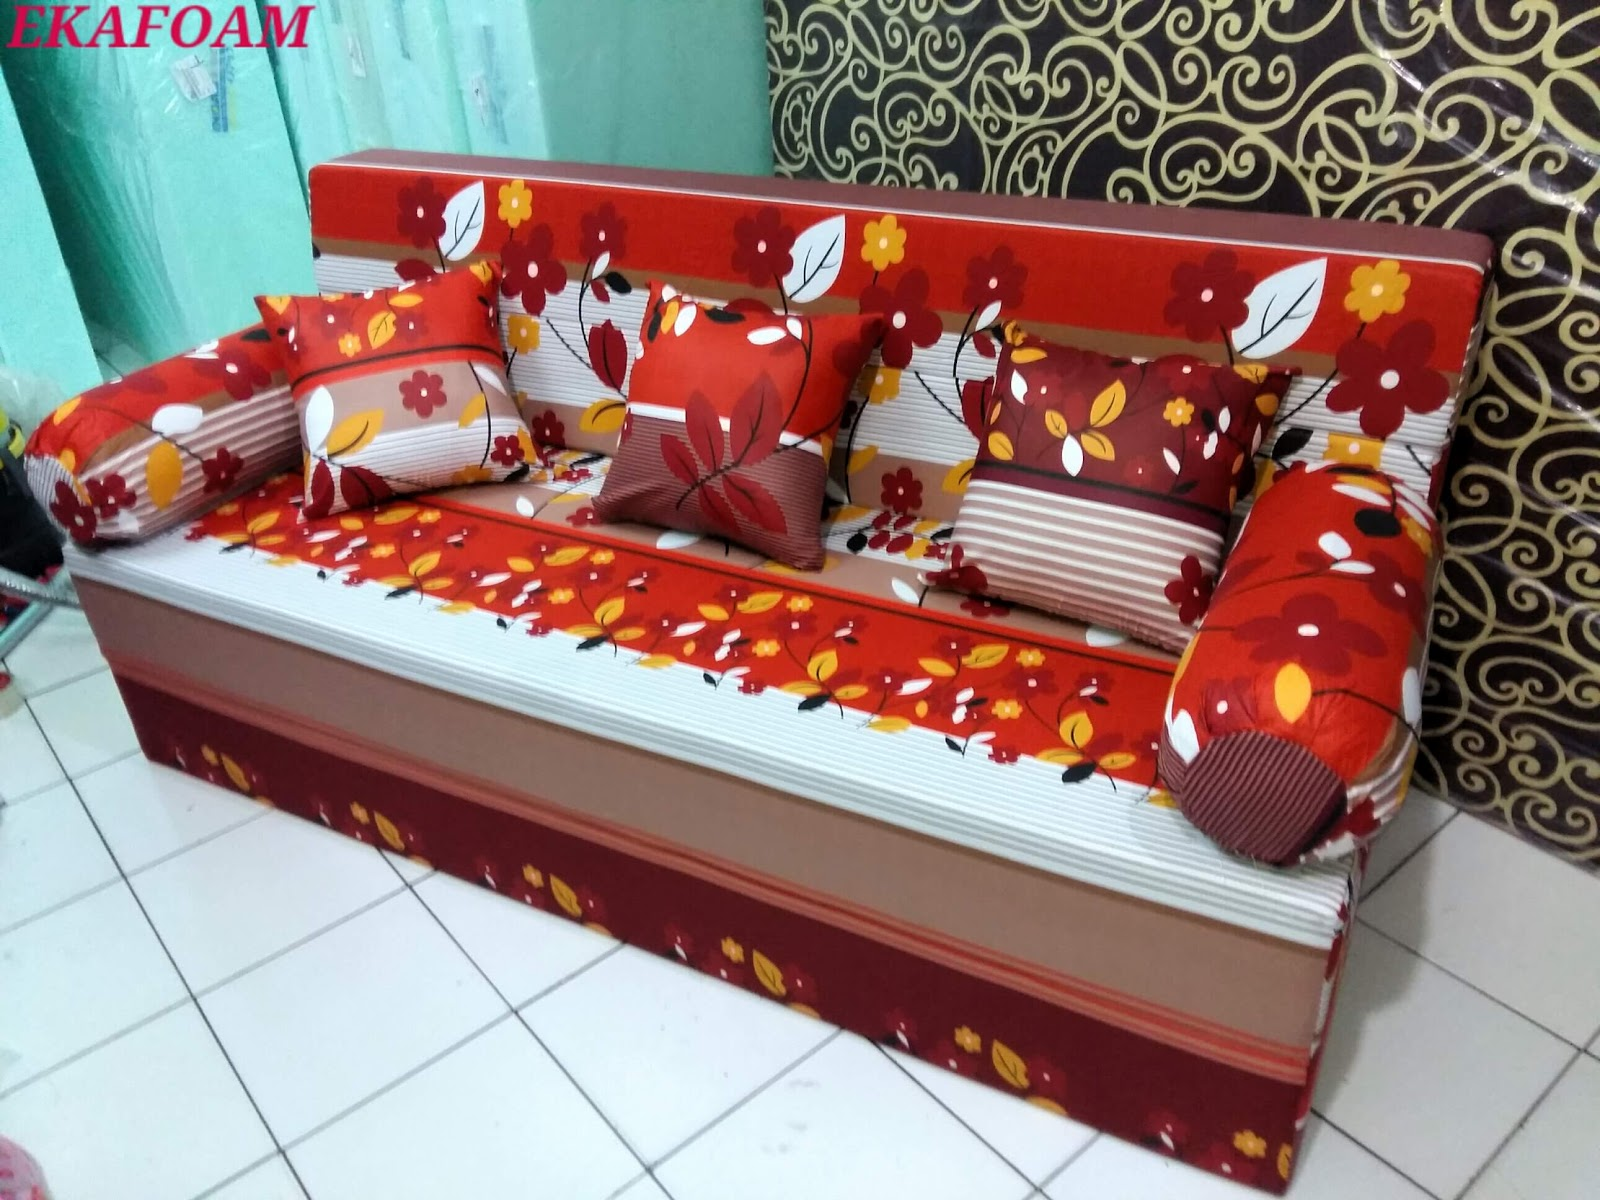 Harga Sofa Bed Inoac No 1 3 Seater With Chaise Terbaru 2017 Agen Jual Kasur Busa